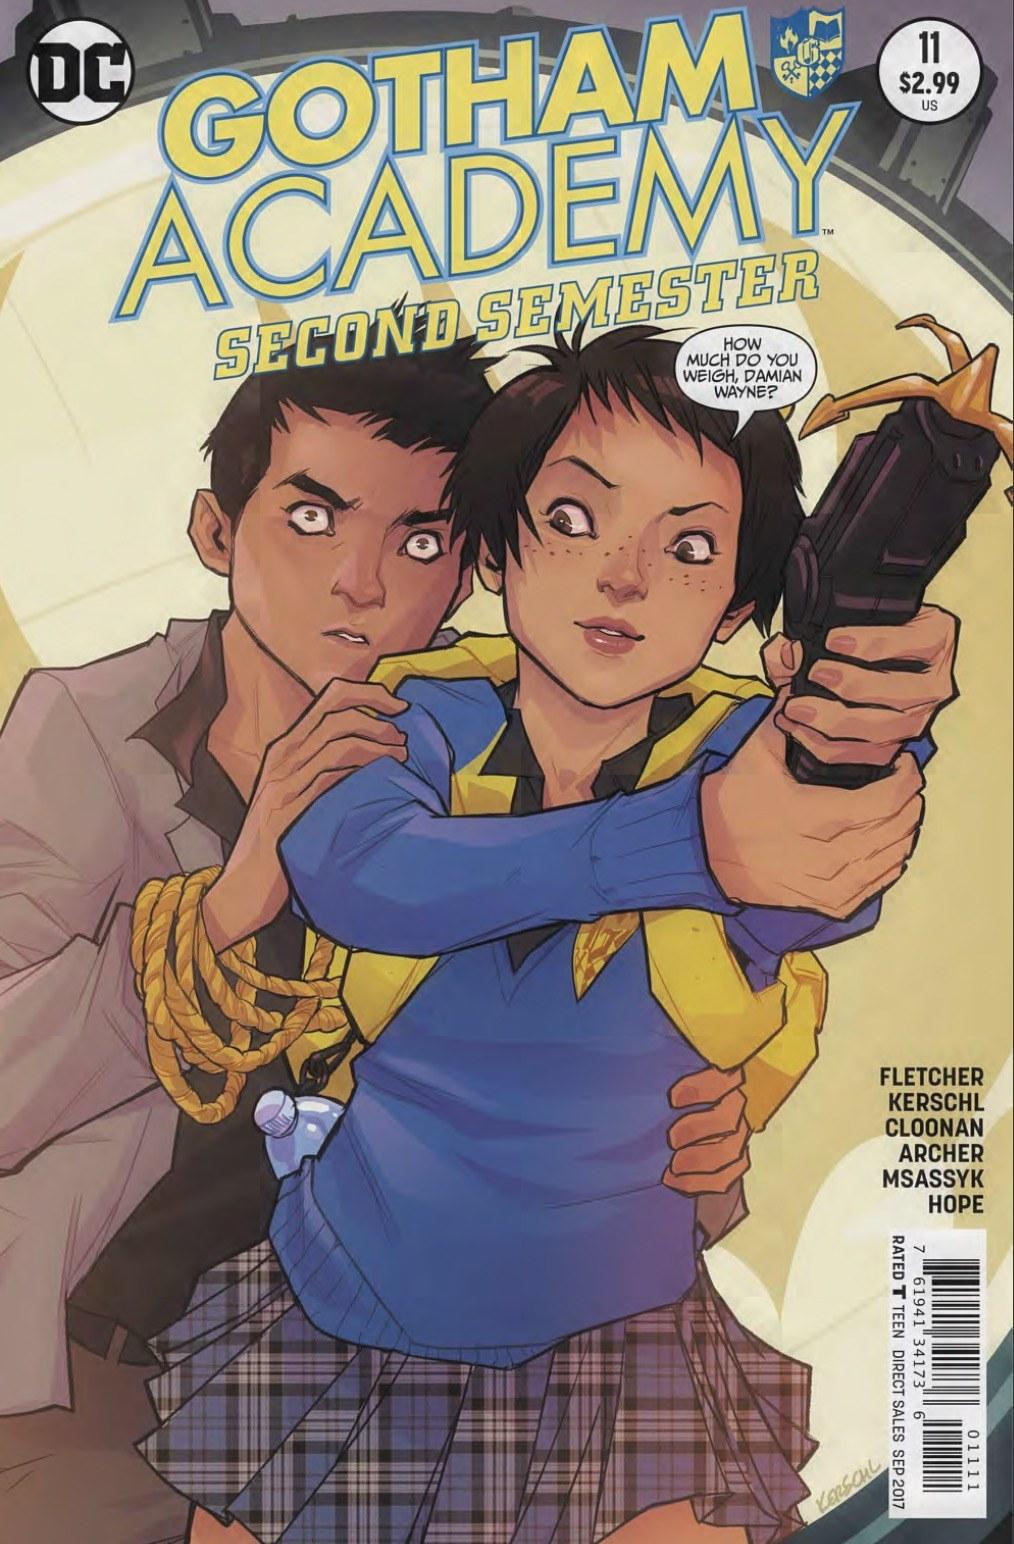 Gotham Academy Second Semester #11 Review